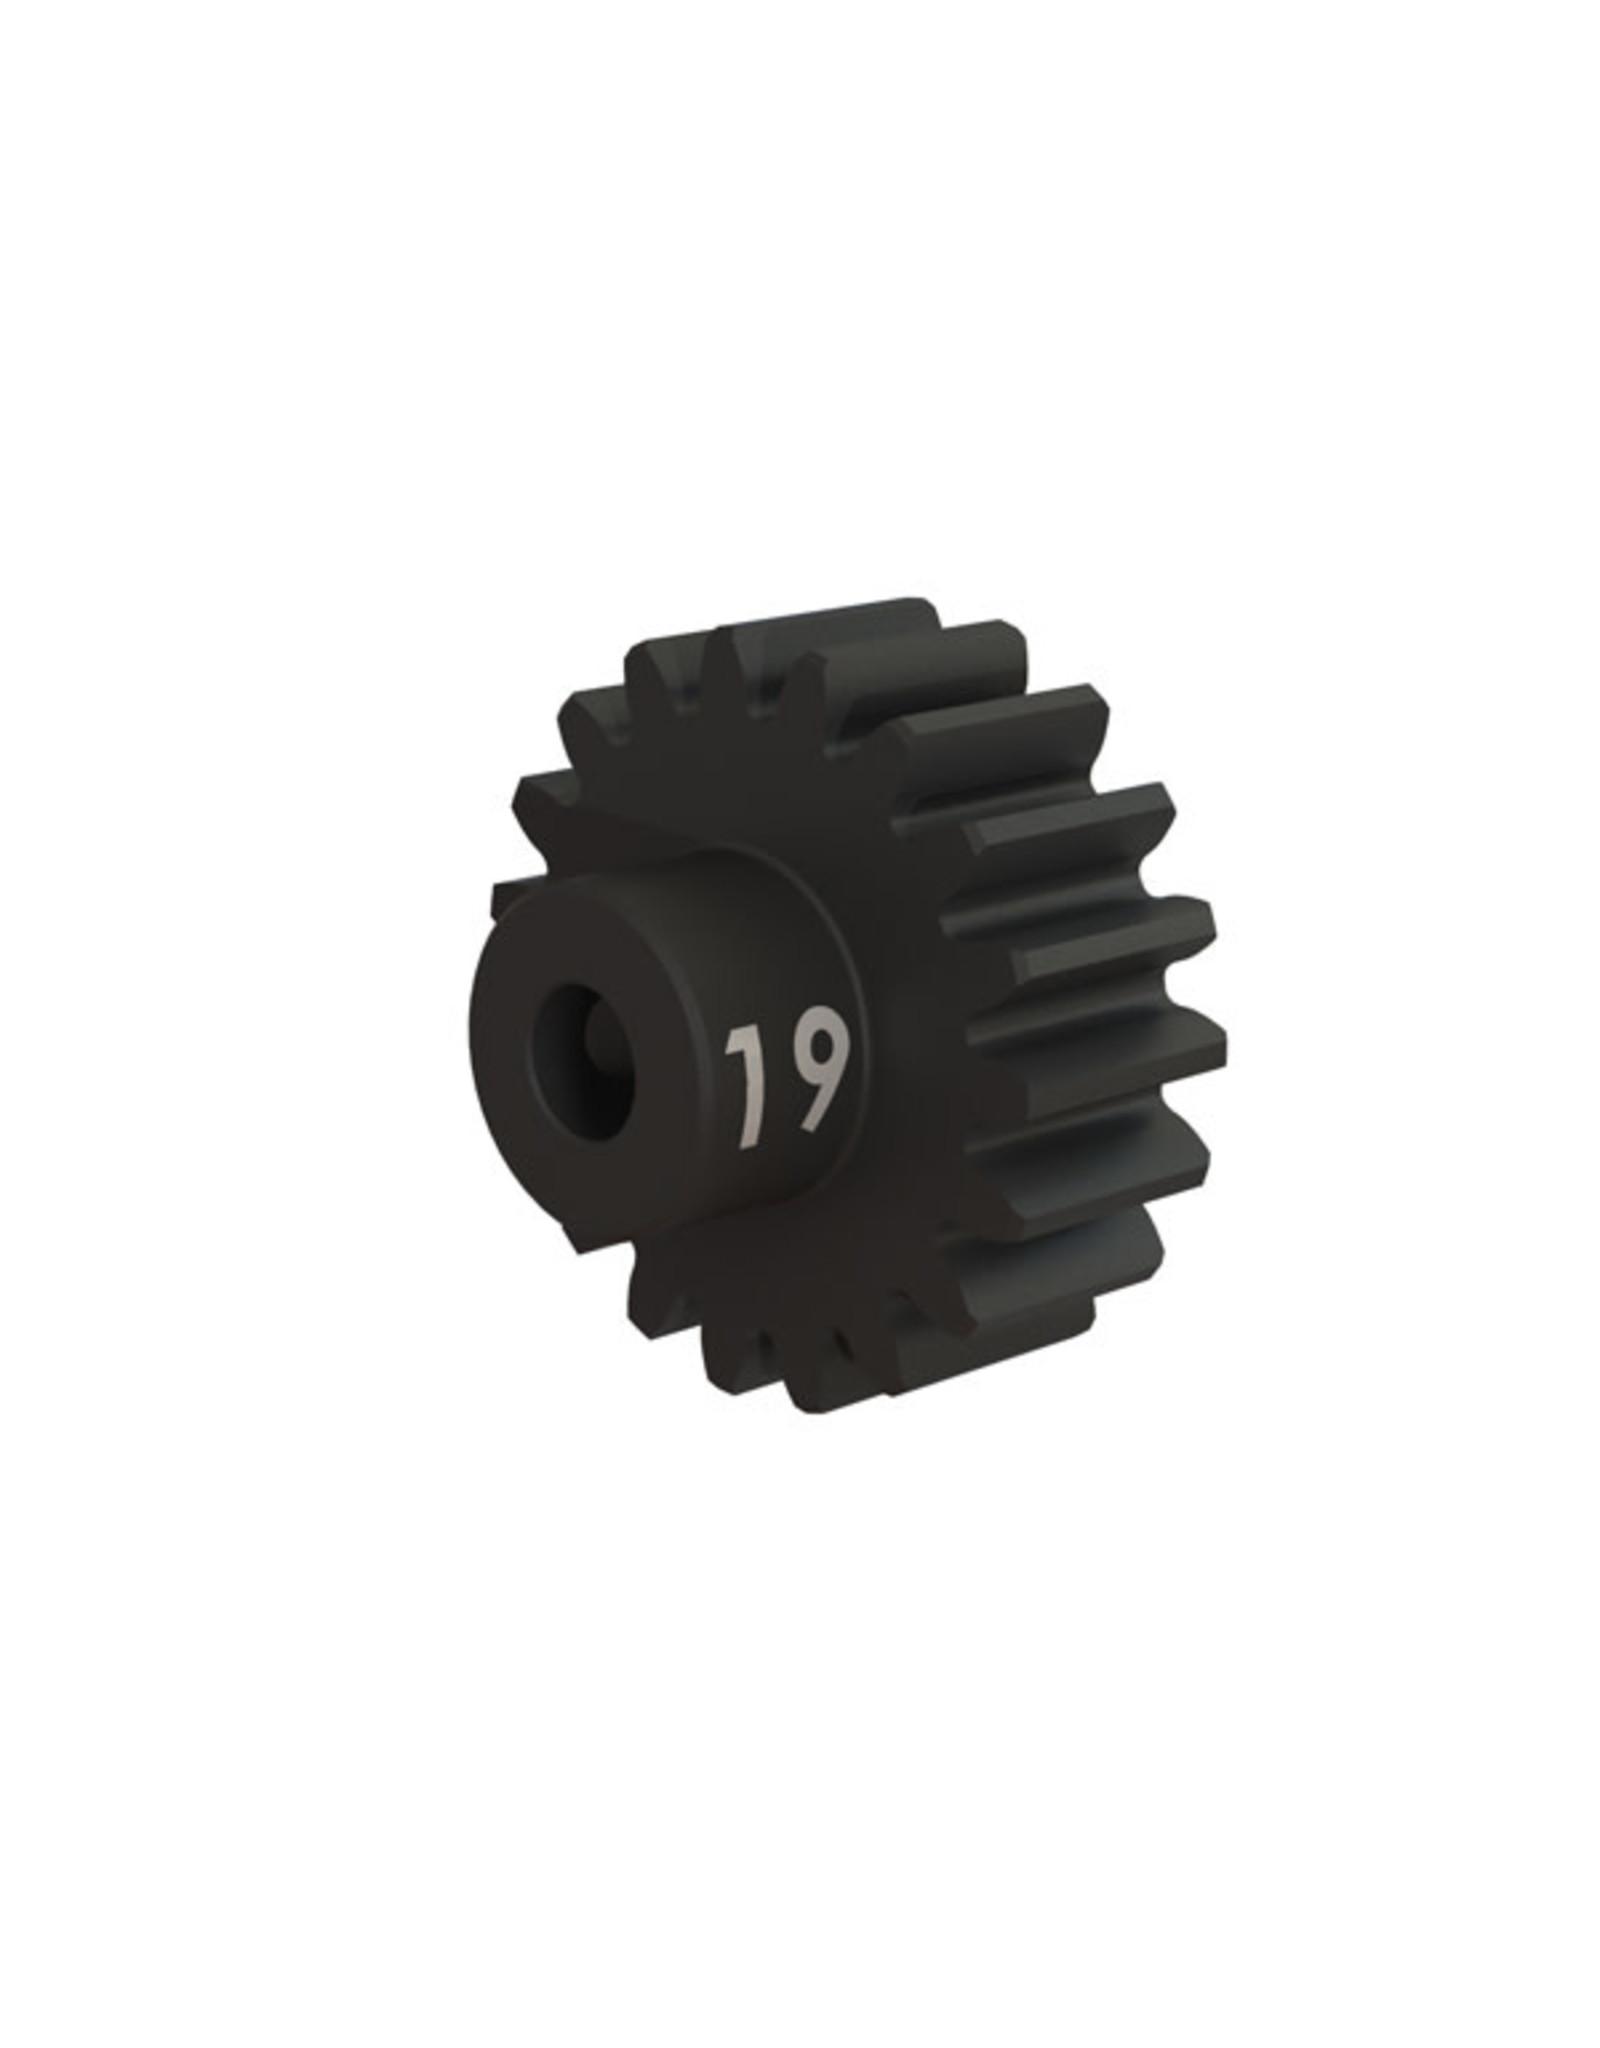 Traxxas [Gear, 19-T pinion (32-p), heavy duty (machined, hardened steel)/ set screw] Gear, 19-T pinion (32-p), heavy duty (machined, hardened steel)/ set screw